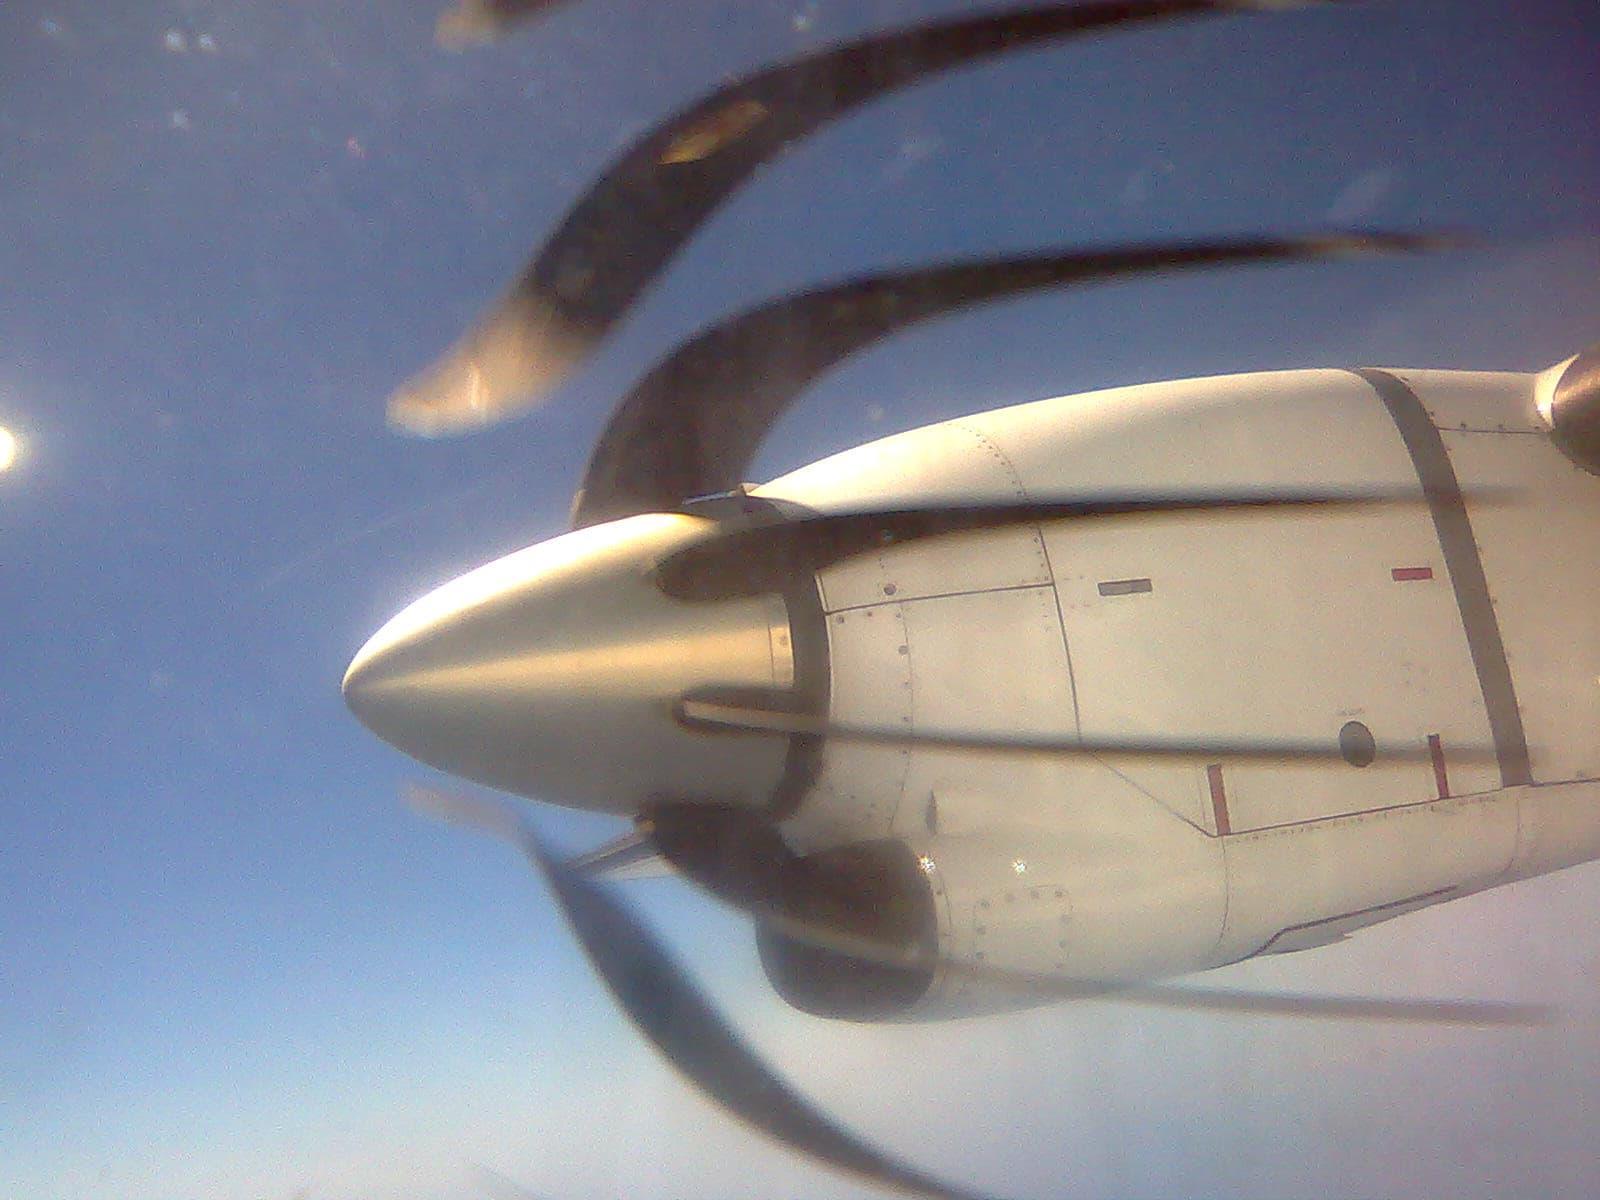 Rolling shutter distortion of propeller blades